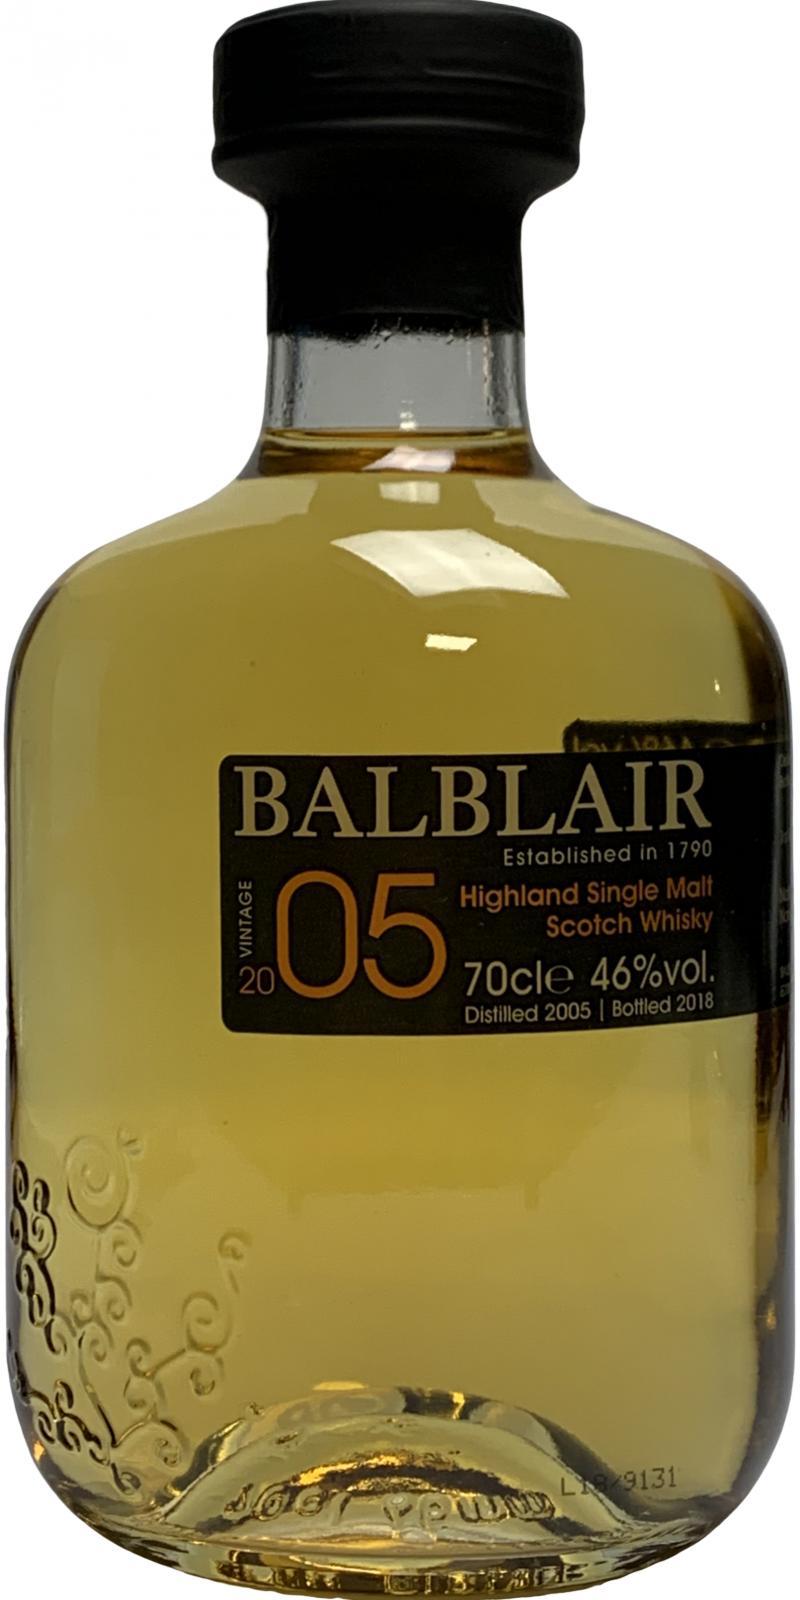 Balblair 2005